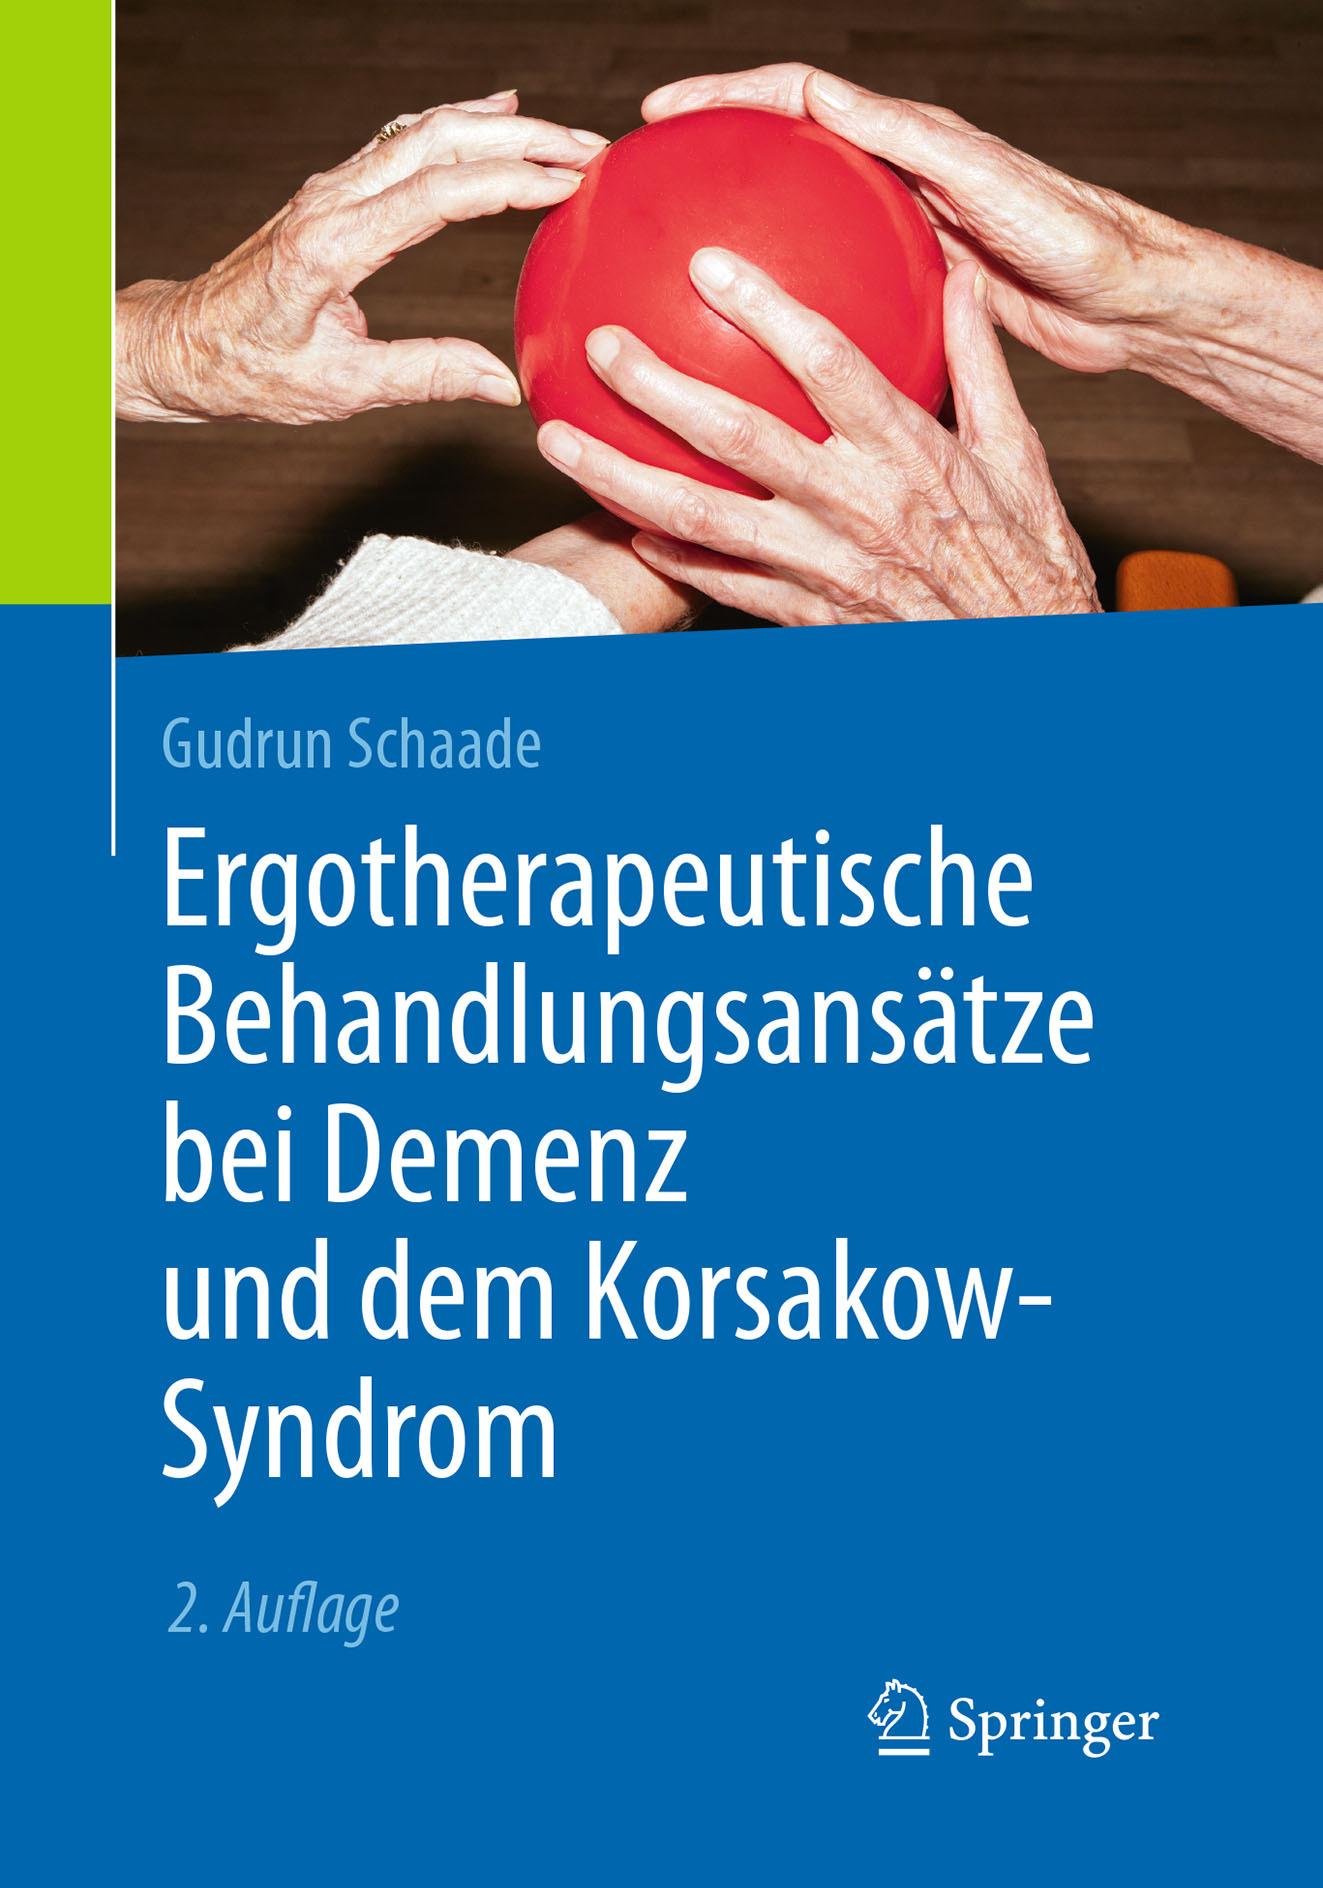 Schaade, Gudrun - Ergotherapeutische Behandlungsansätze bei Demenz und dem Korsakow-Syndrom, ebook